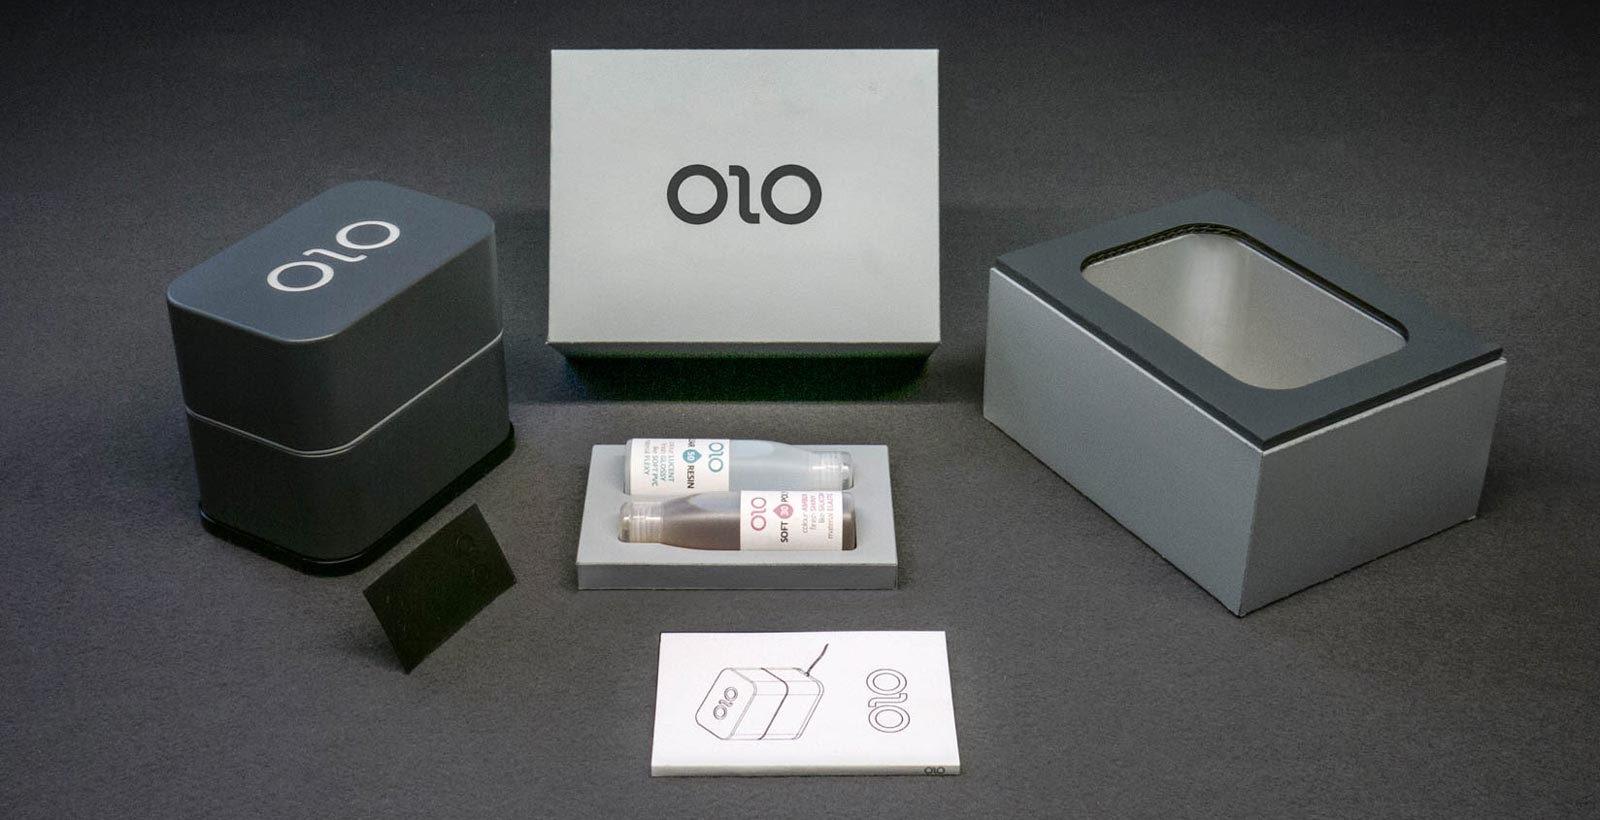 olo03